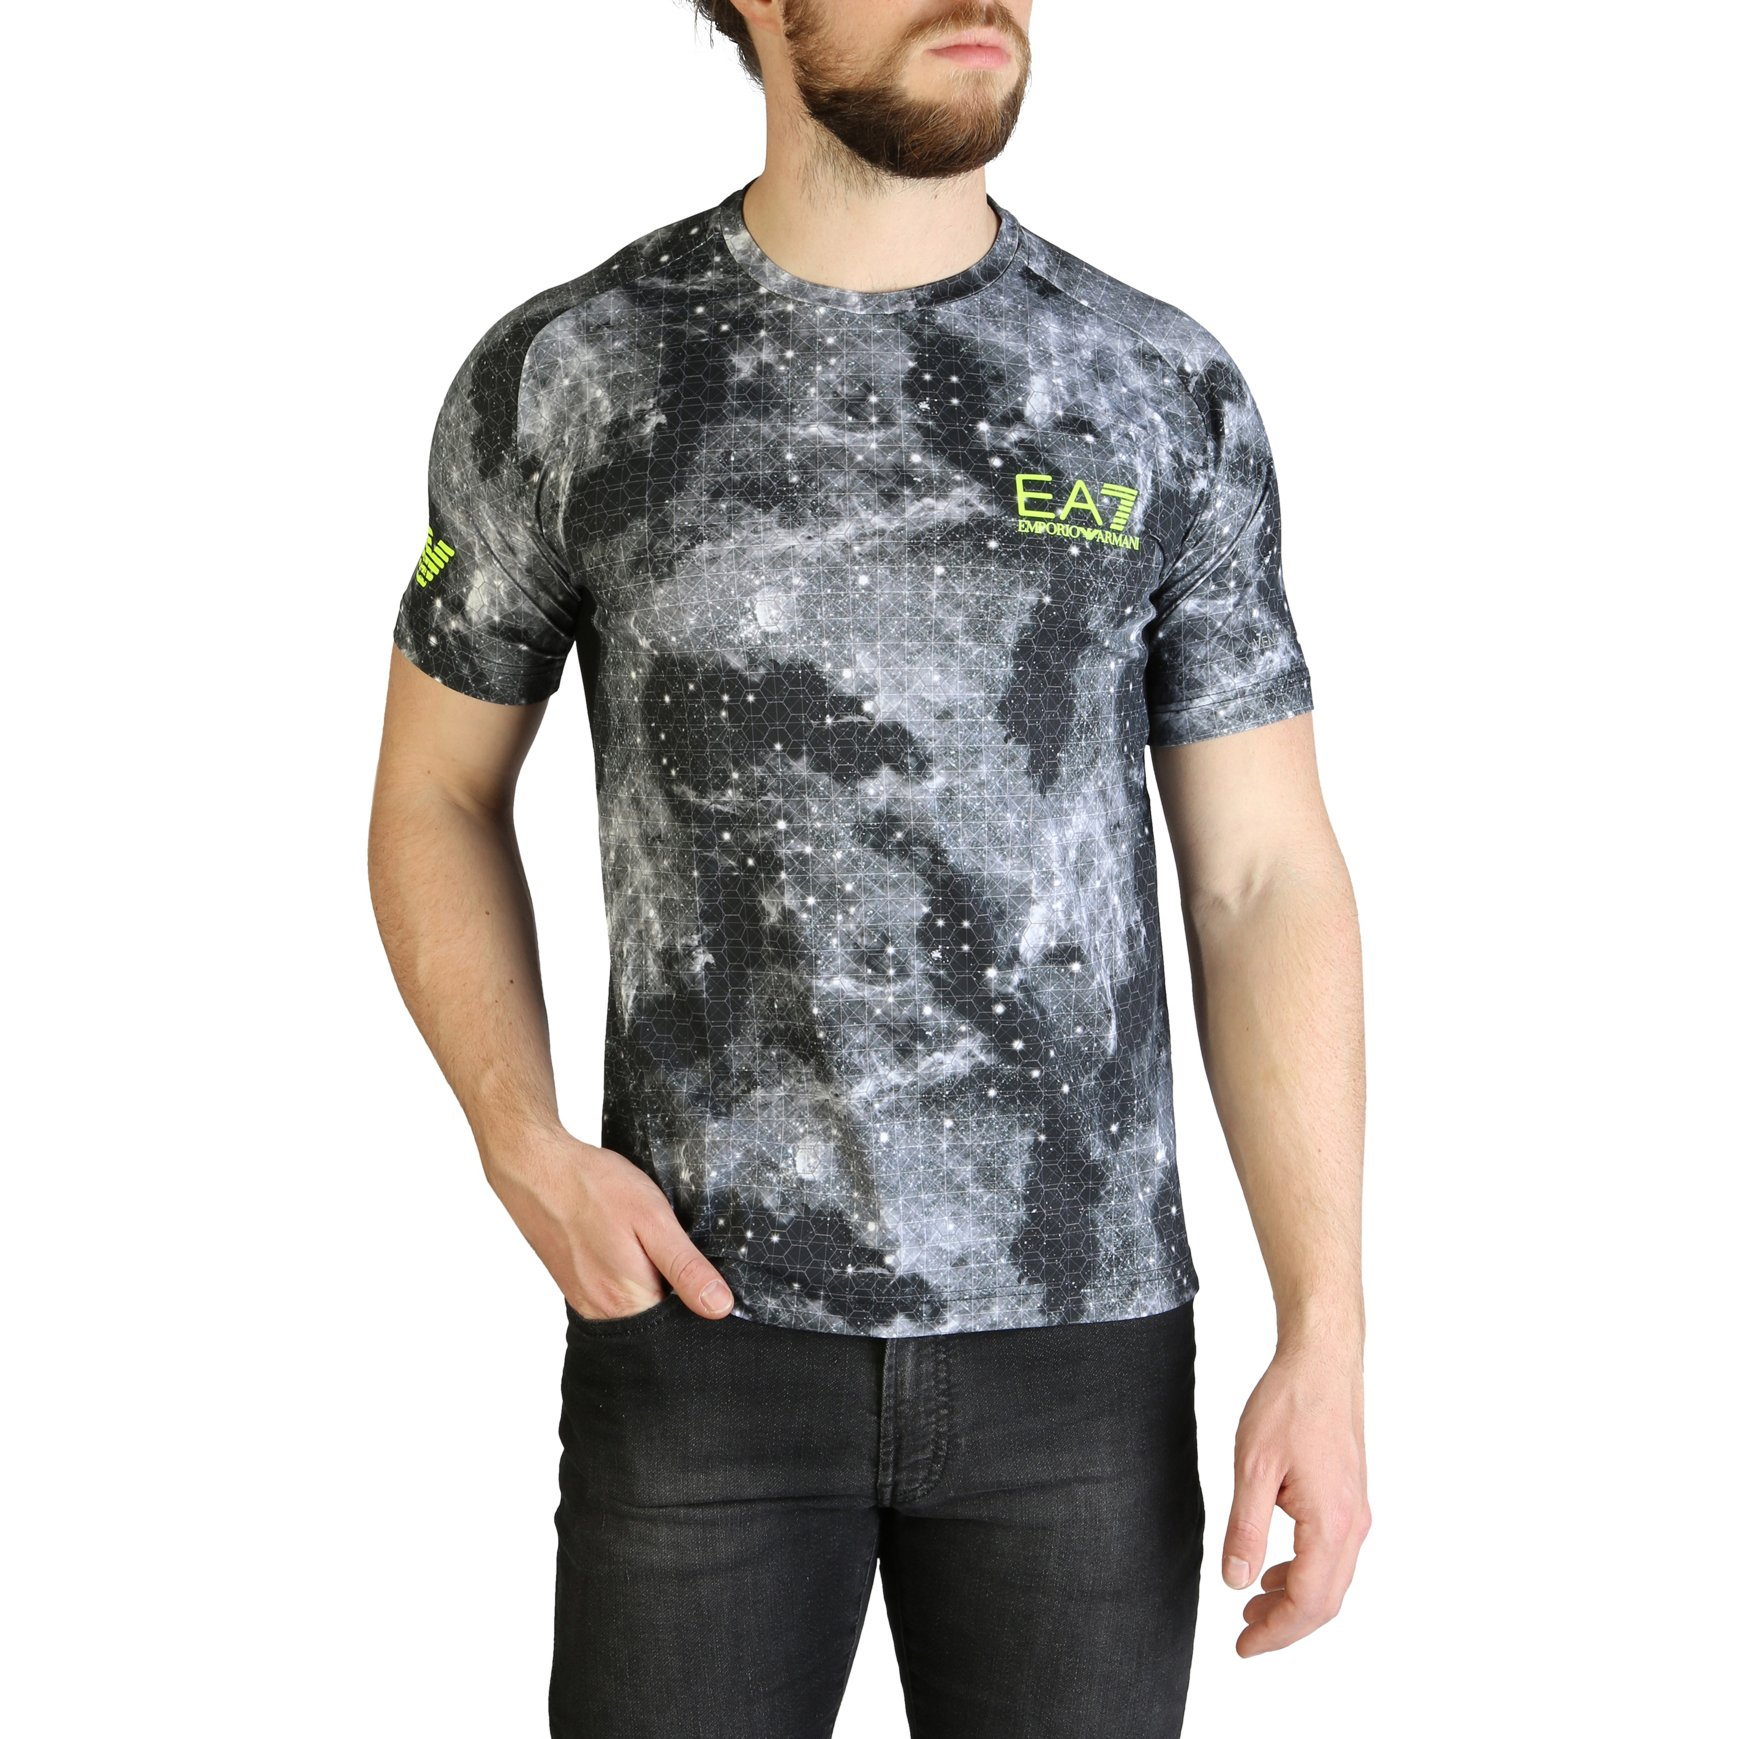 EA7 Men's T-Shirt Green 3GPT93_PJ2BZ - black M